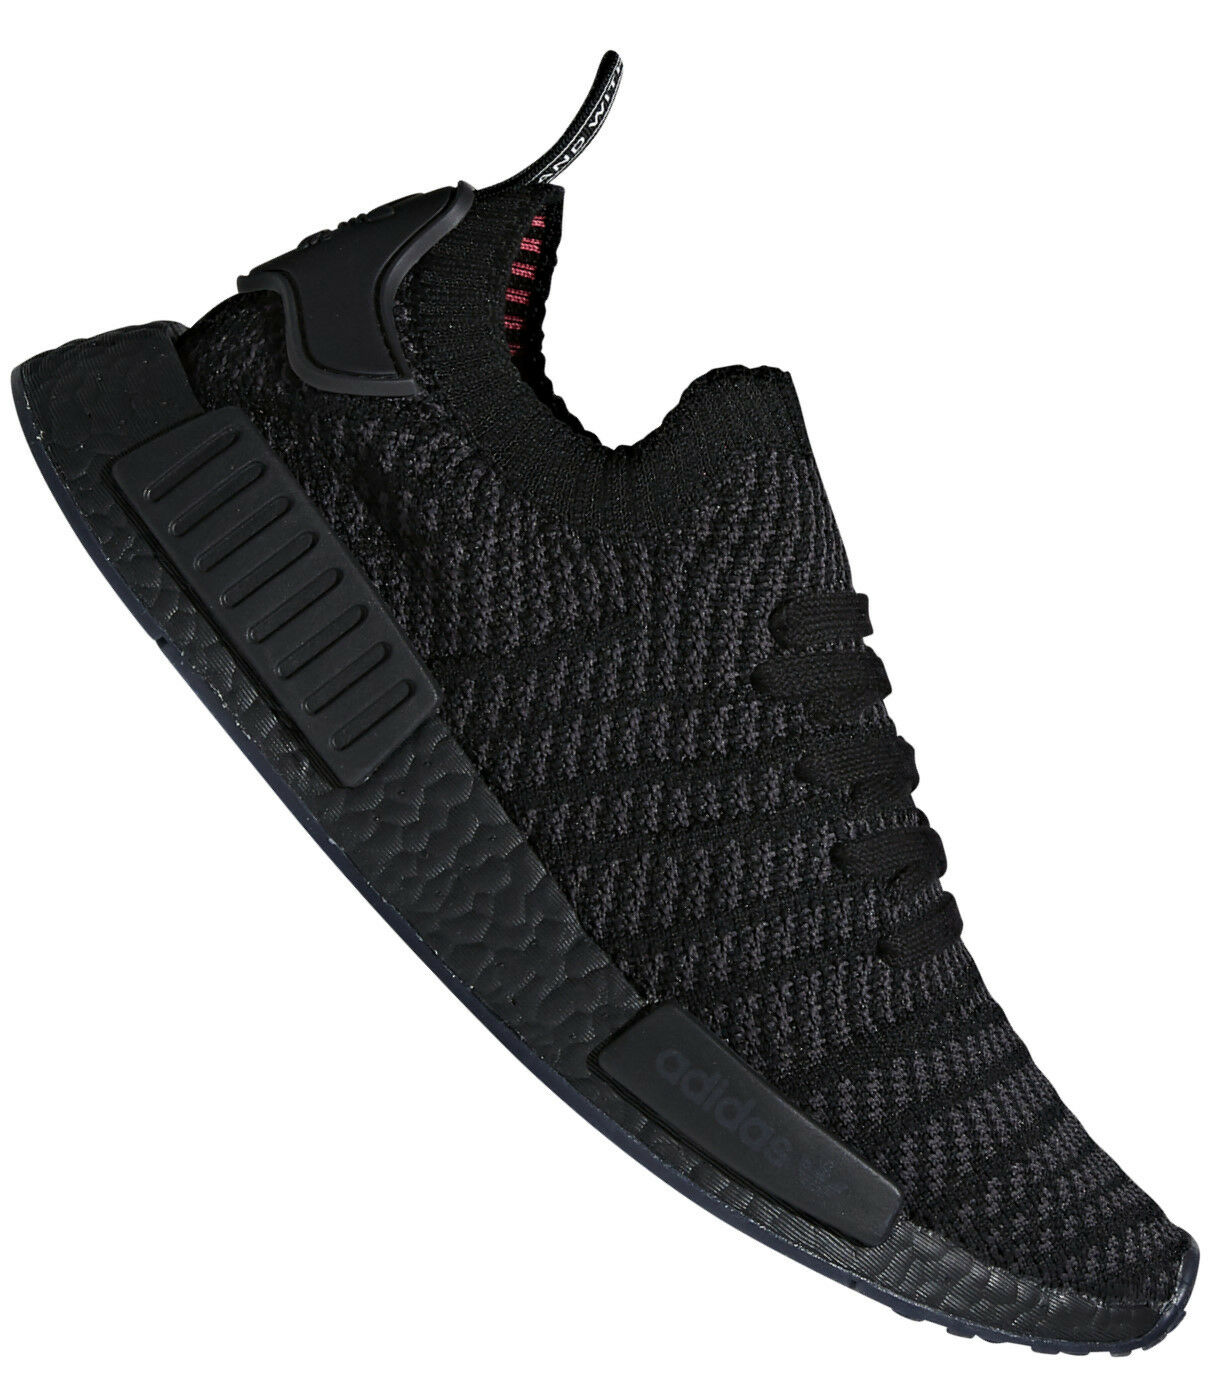 Adidas NMD R1 STLT PK Sneaker Adidas Turnschuh schwarz/schwarz schwarz/schwarz schwarz/schwarz 4129dc